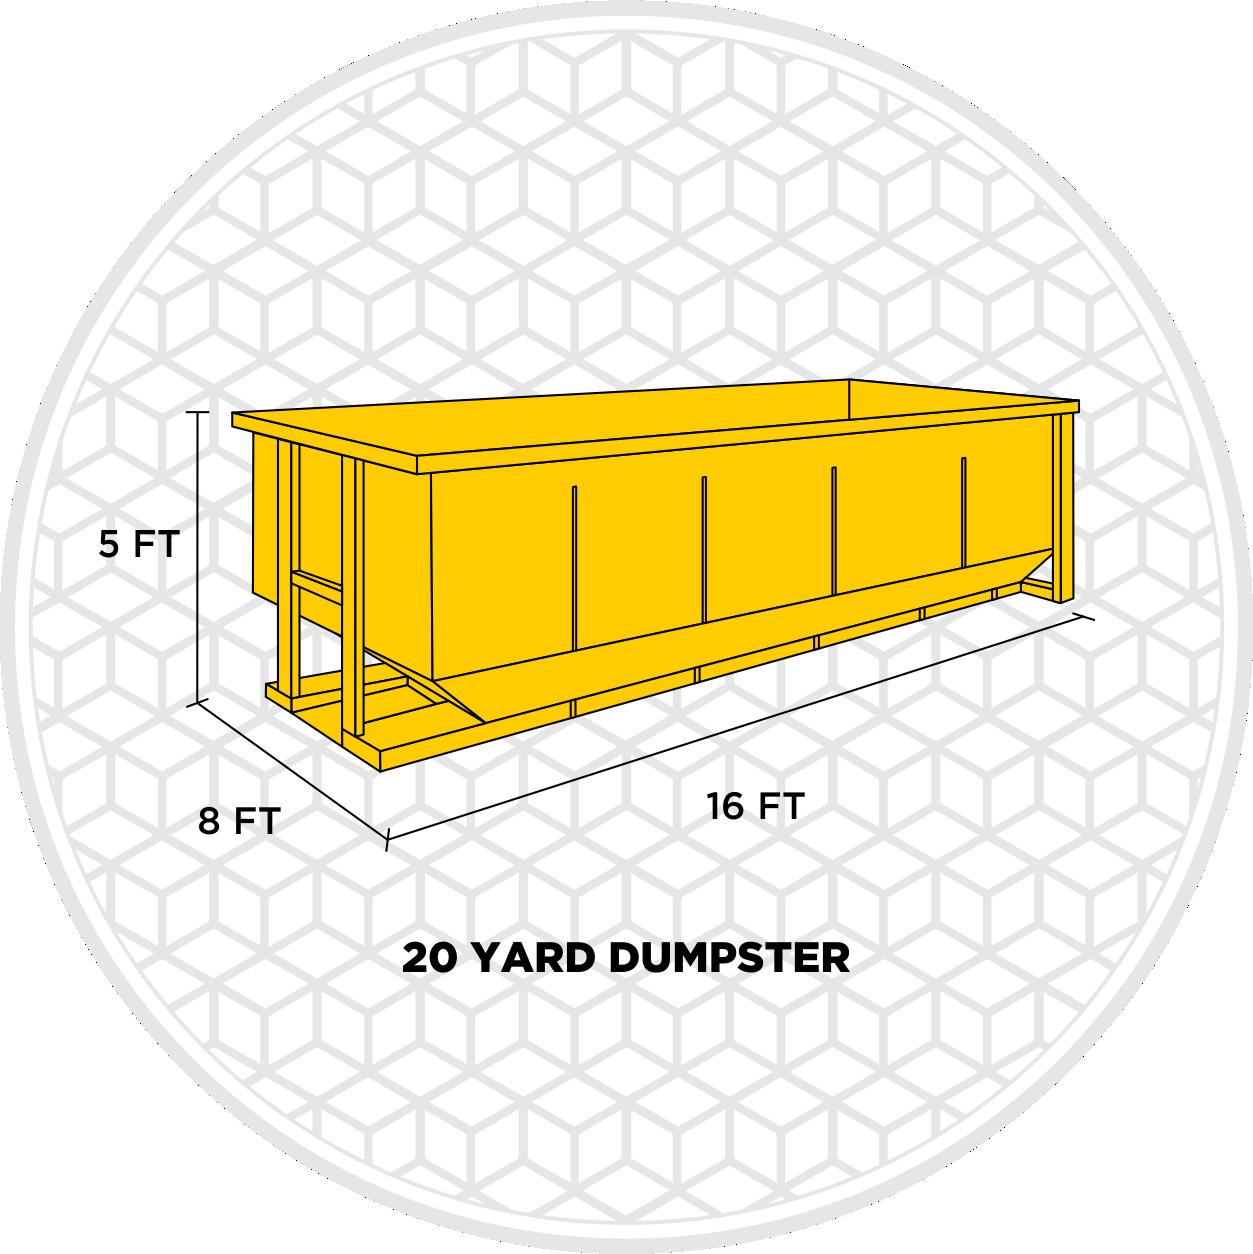 20 yard dumpster rental size